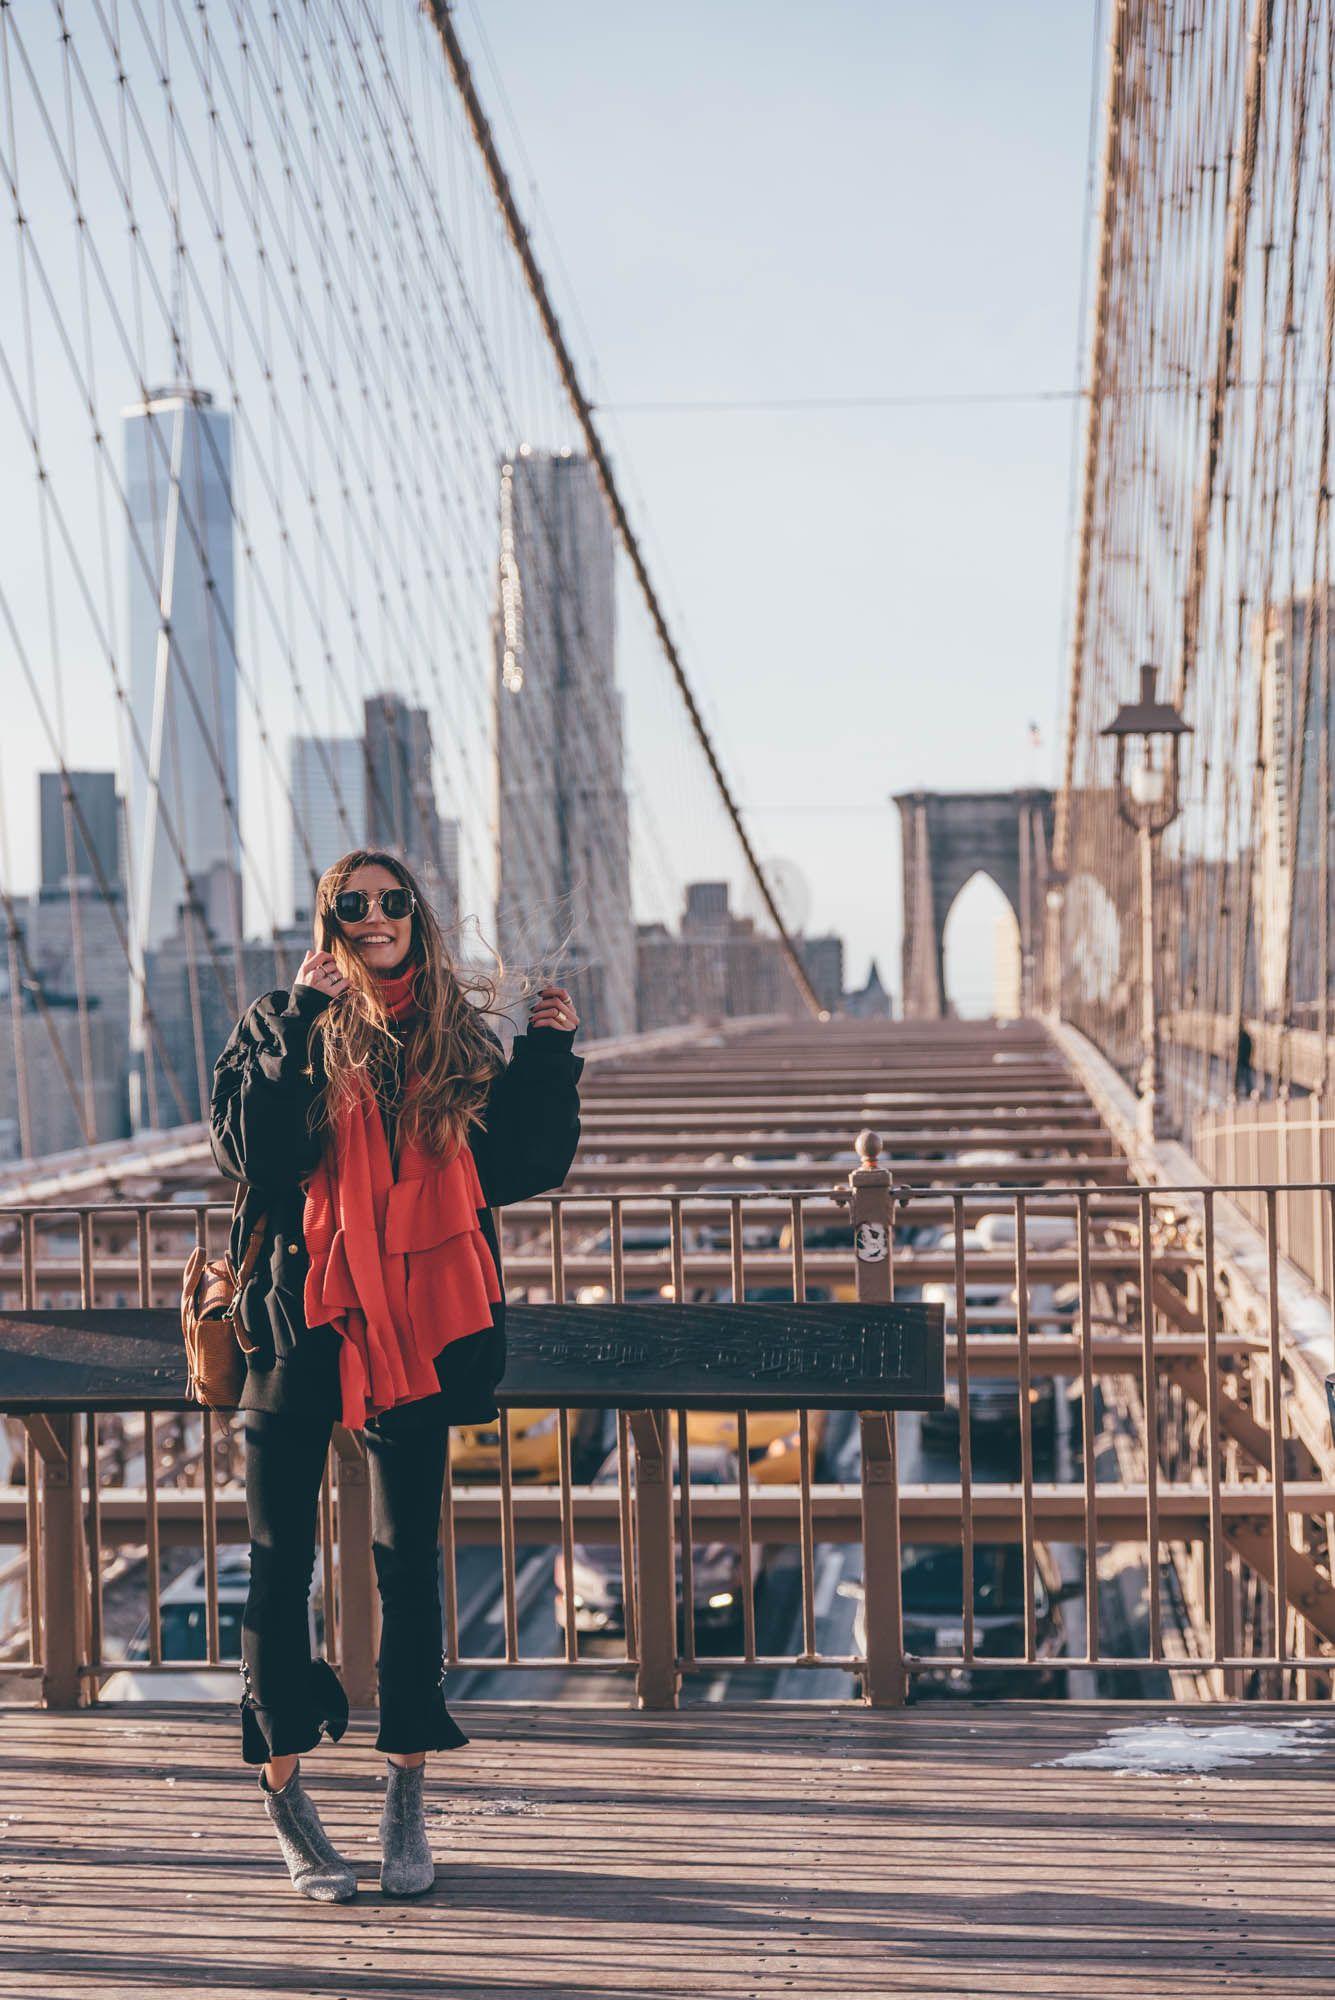 Brooklyn Bridge New York City on THELFASHION.COM | Wearing Glitter Boots, Skinny Jeans & oversized Bomber Jacket